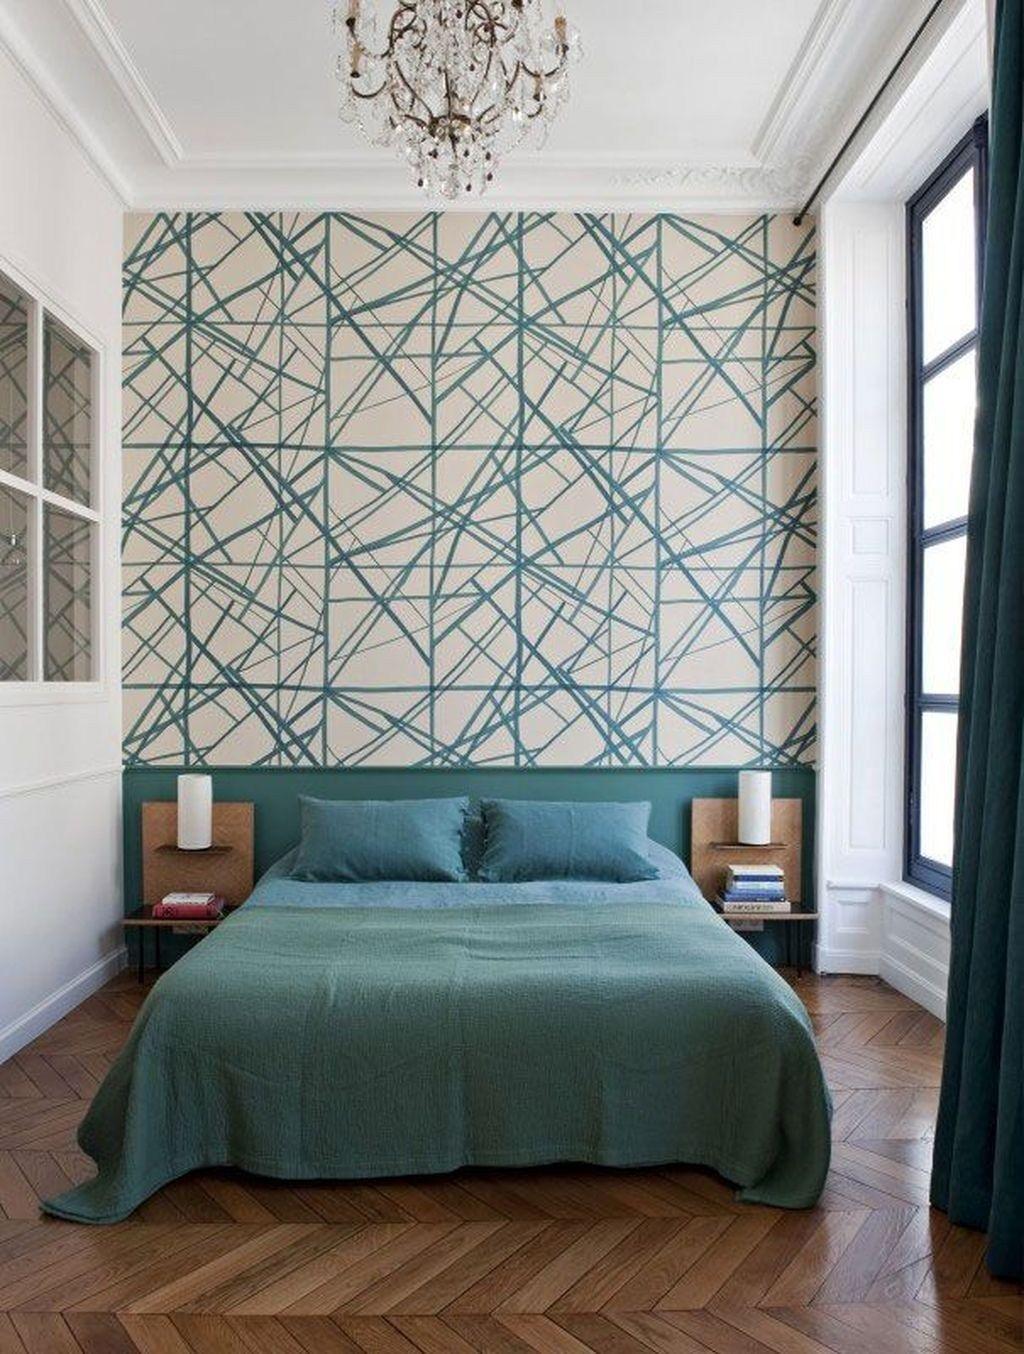 40 Fabulous Bedroom Wallpaper Design Ideas For You In 2020 Wallpaper Design For Bedroom Bedroom Wall Designs Wallpaper Interior Design